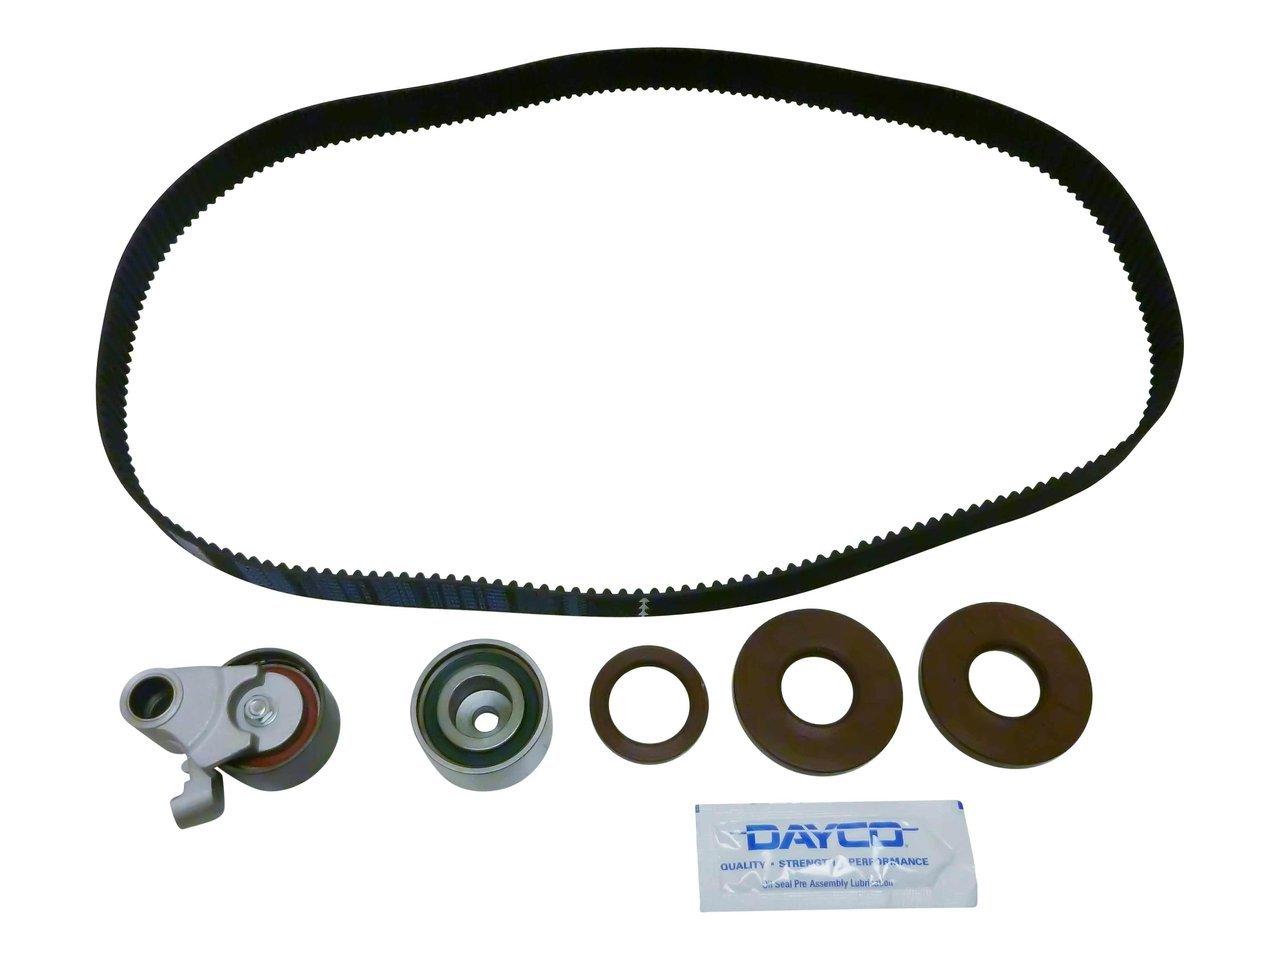 Timing Belt Kit Suitable For Landcruiser 47 V8 Petrol 2uzfe Dayco Volkswagen Idler Uzj100 Uzj200